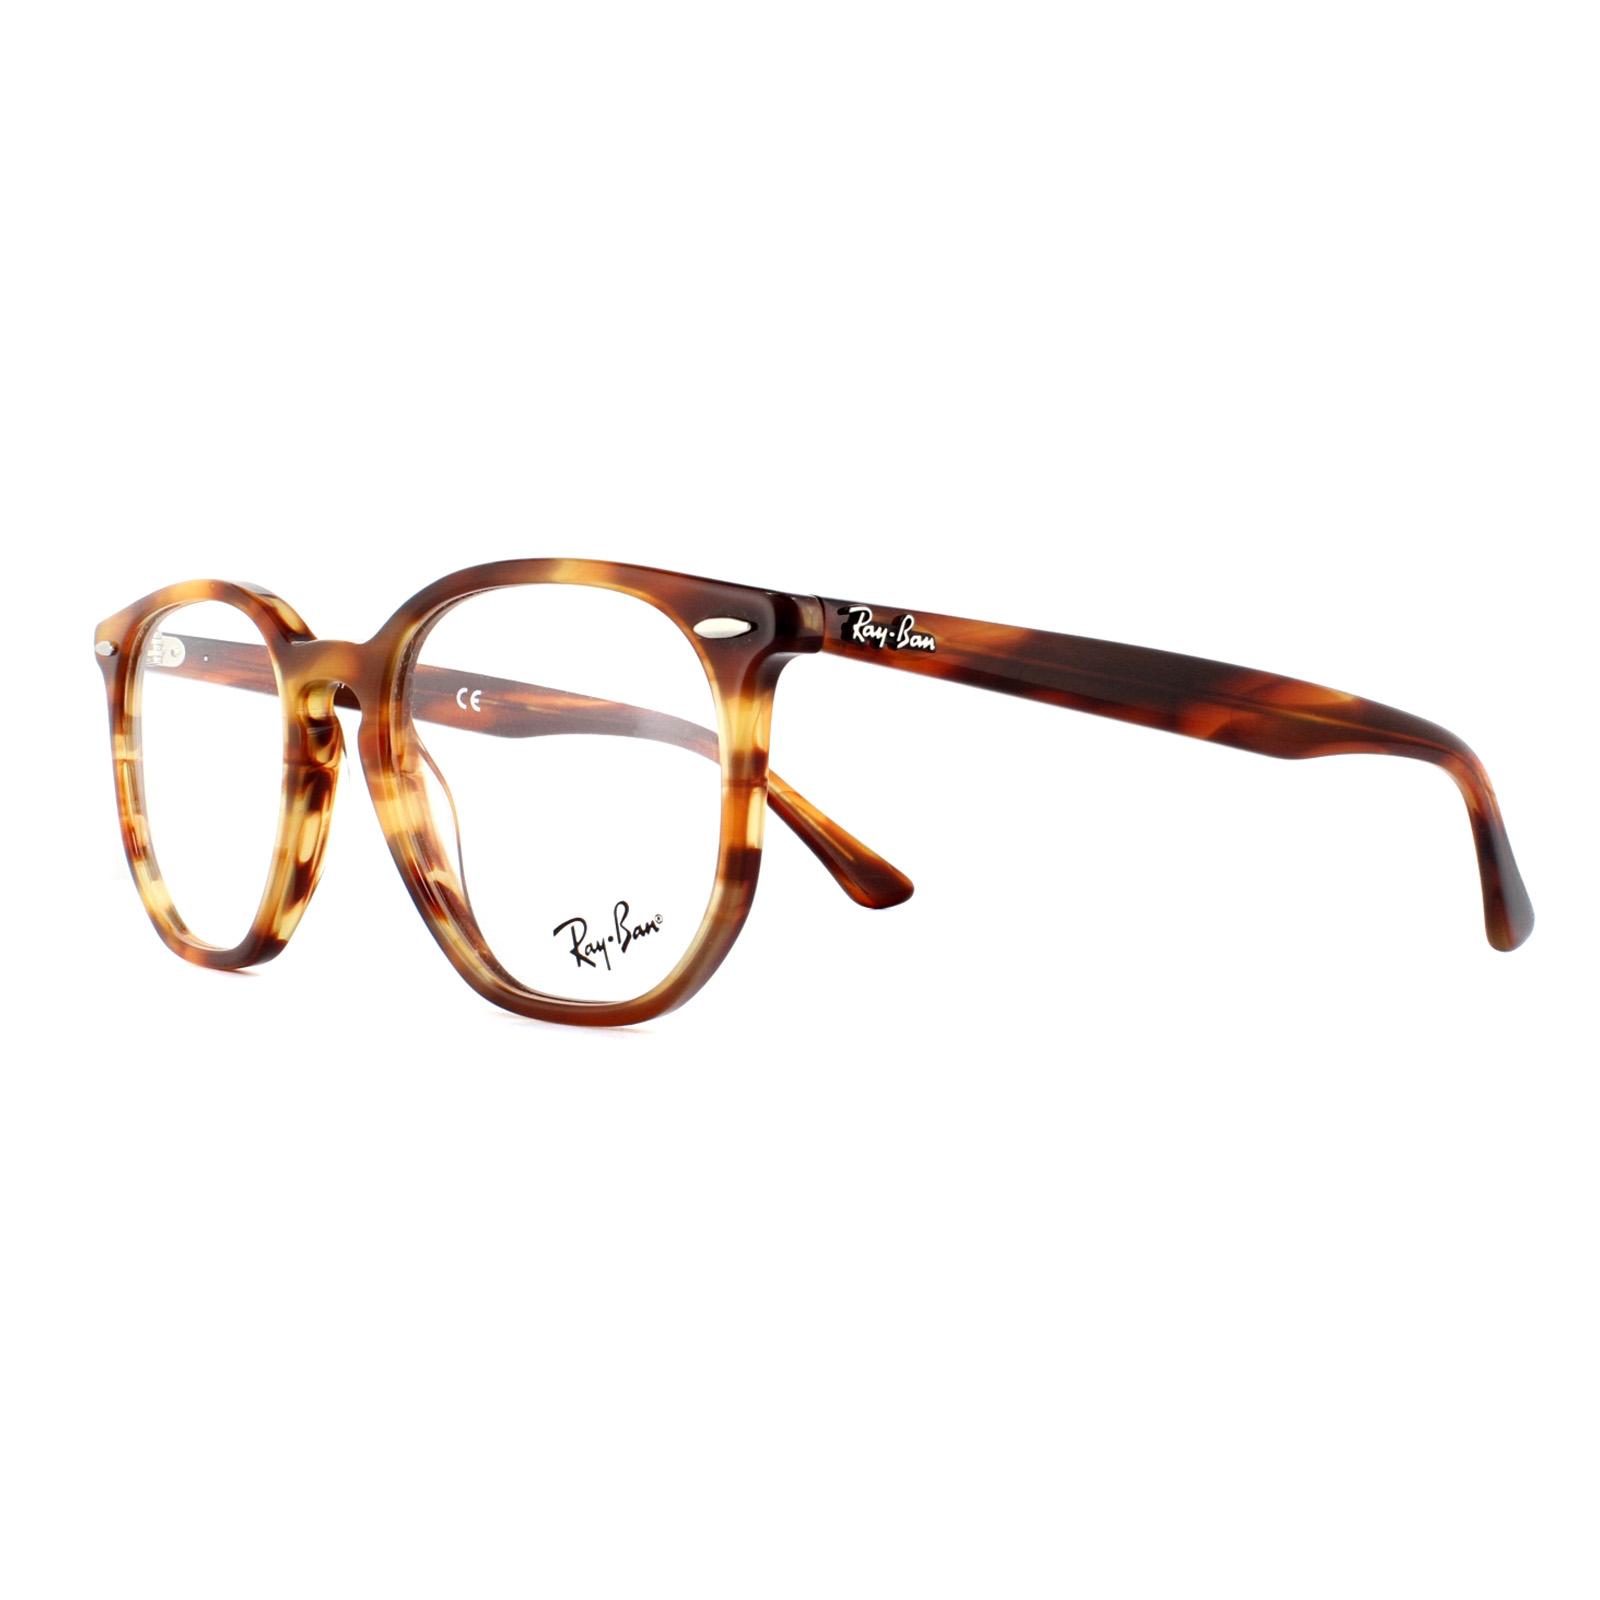 5b063019bf Cheap Ray-Ban 7151 Hexagonal Glasses Frames - Discounted Sunglasses